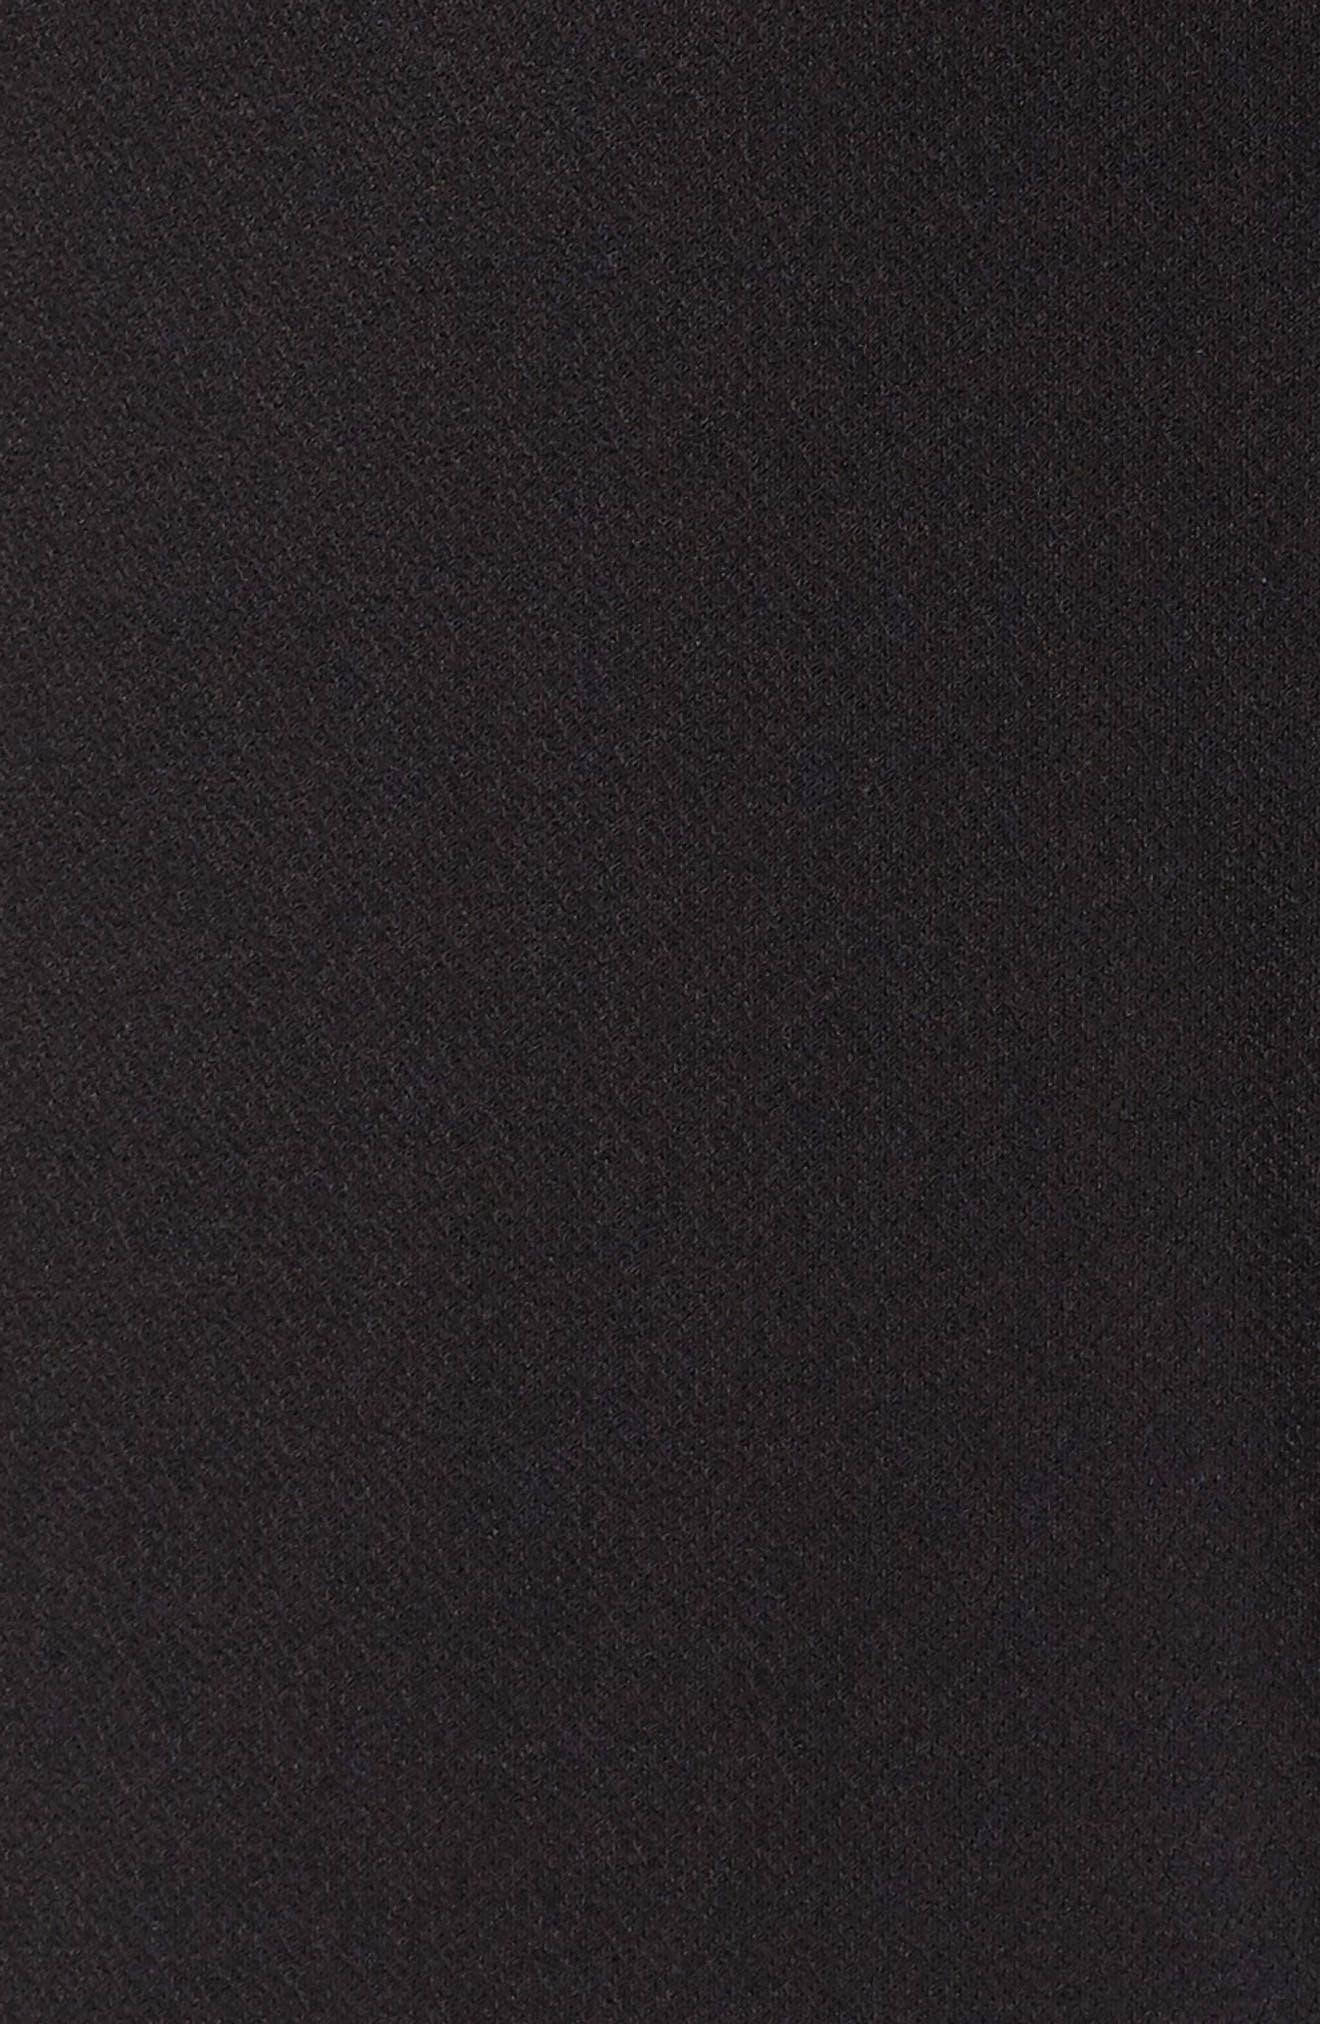 Tiered Ruffle Sleeve Crepe Jumpsuit,                             Alternate thumbnail 5, color,                             001